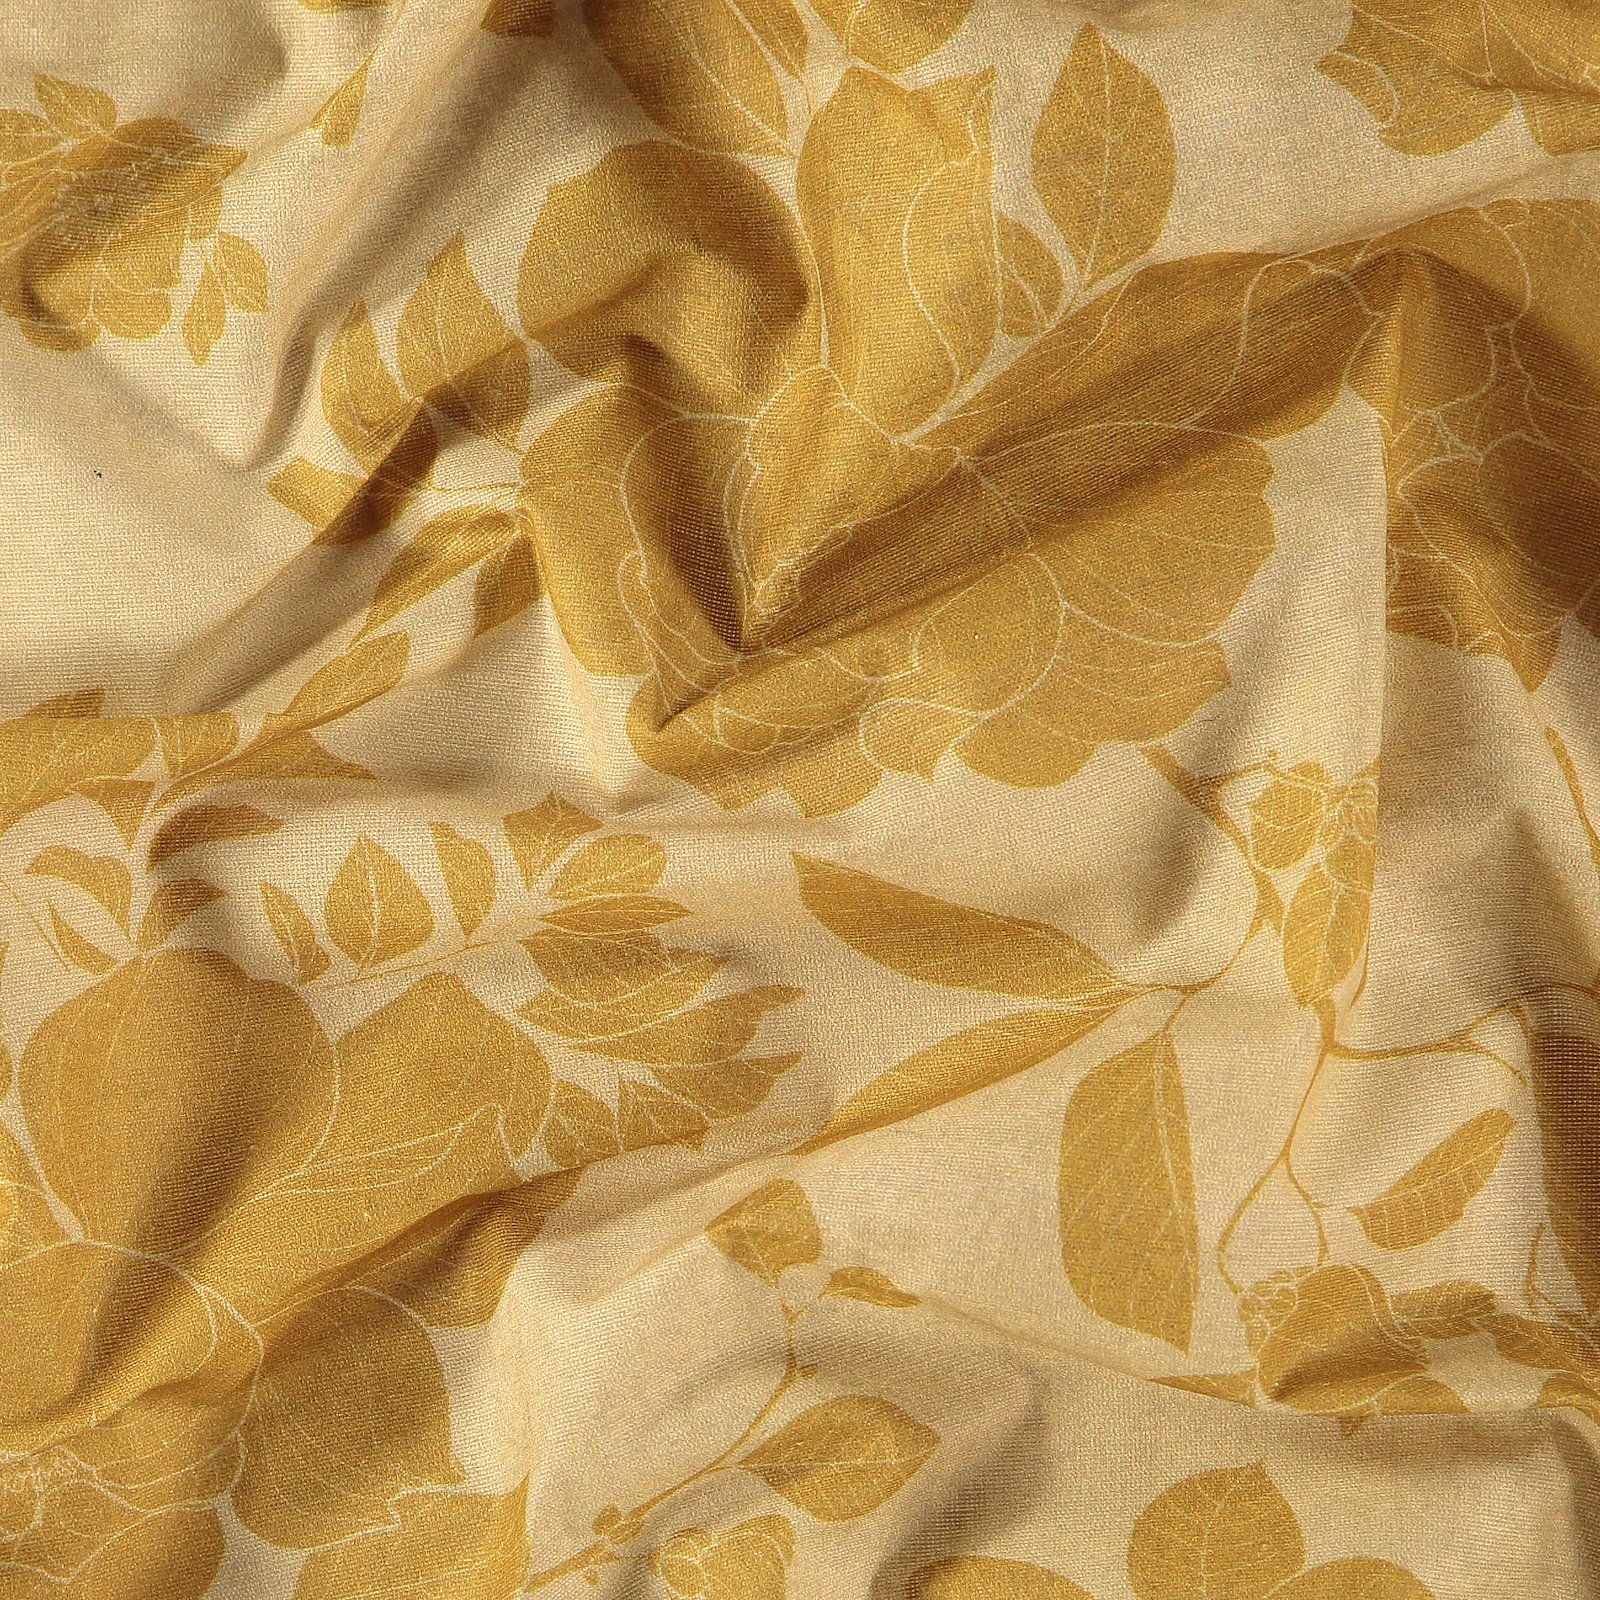 Woven oilcloth light warm curry w flower